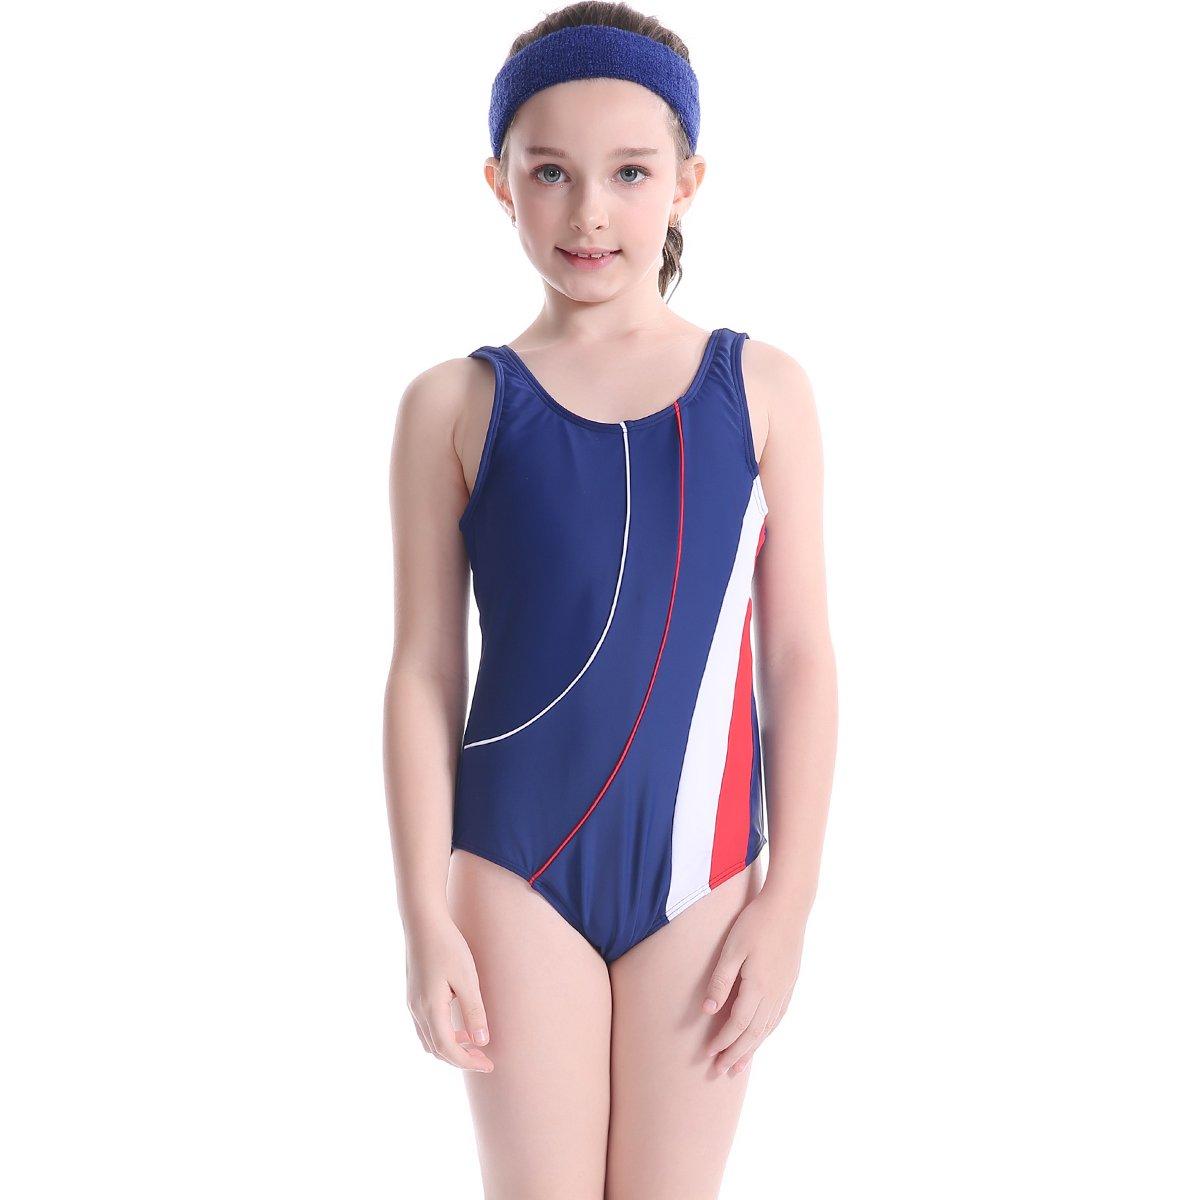 TenMet Girl's Swimsuit One Piece Elastic Racer Back Anti UV Sun Protection Swimwear Monokini Bathing Suit Beachwear